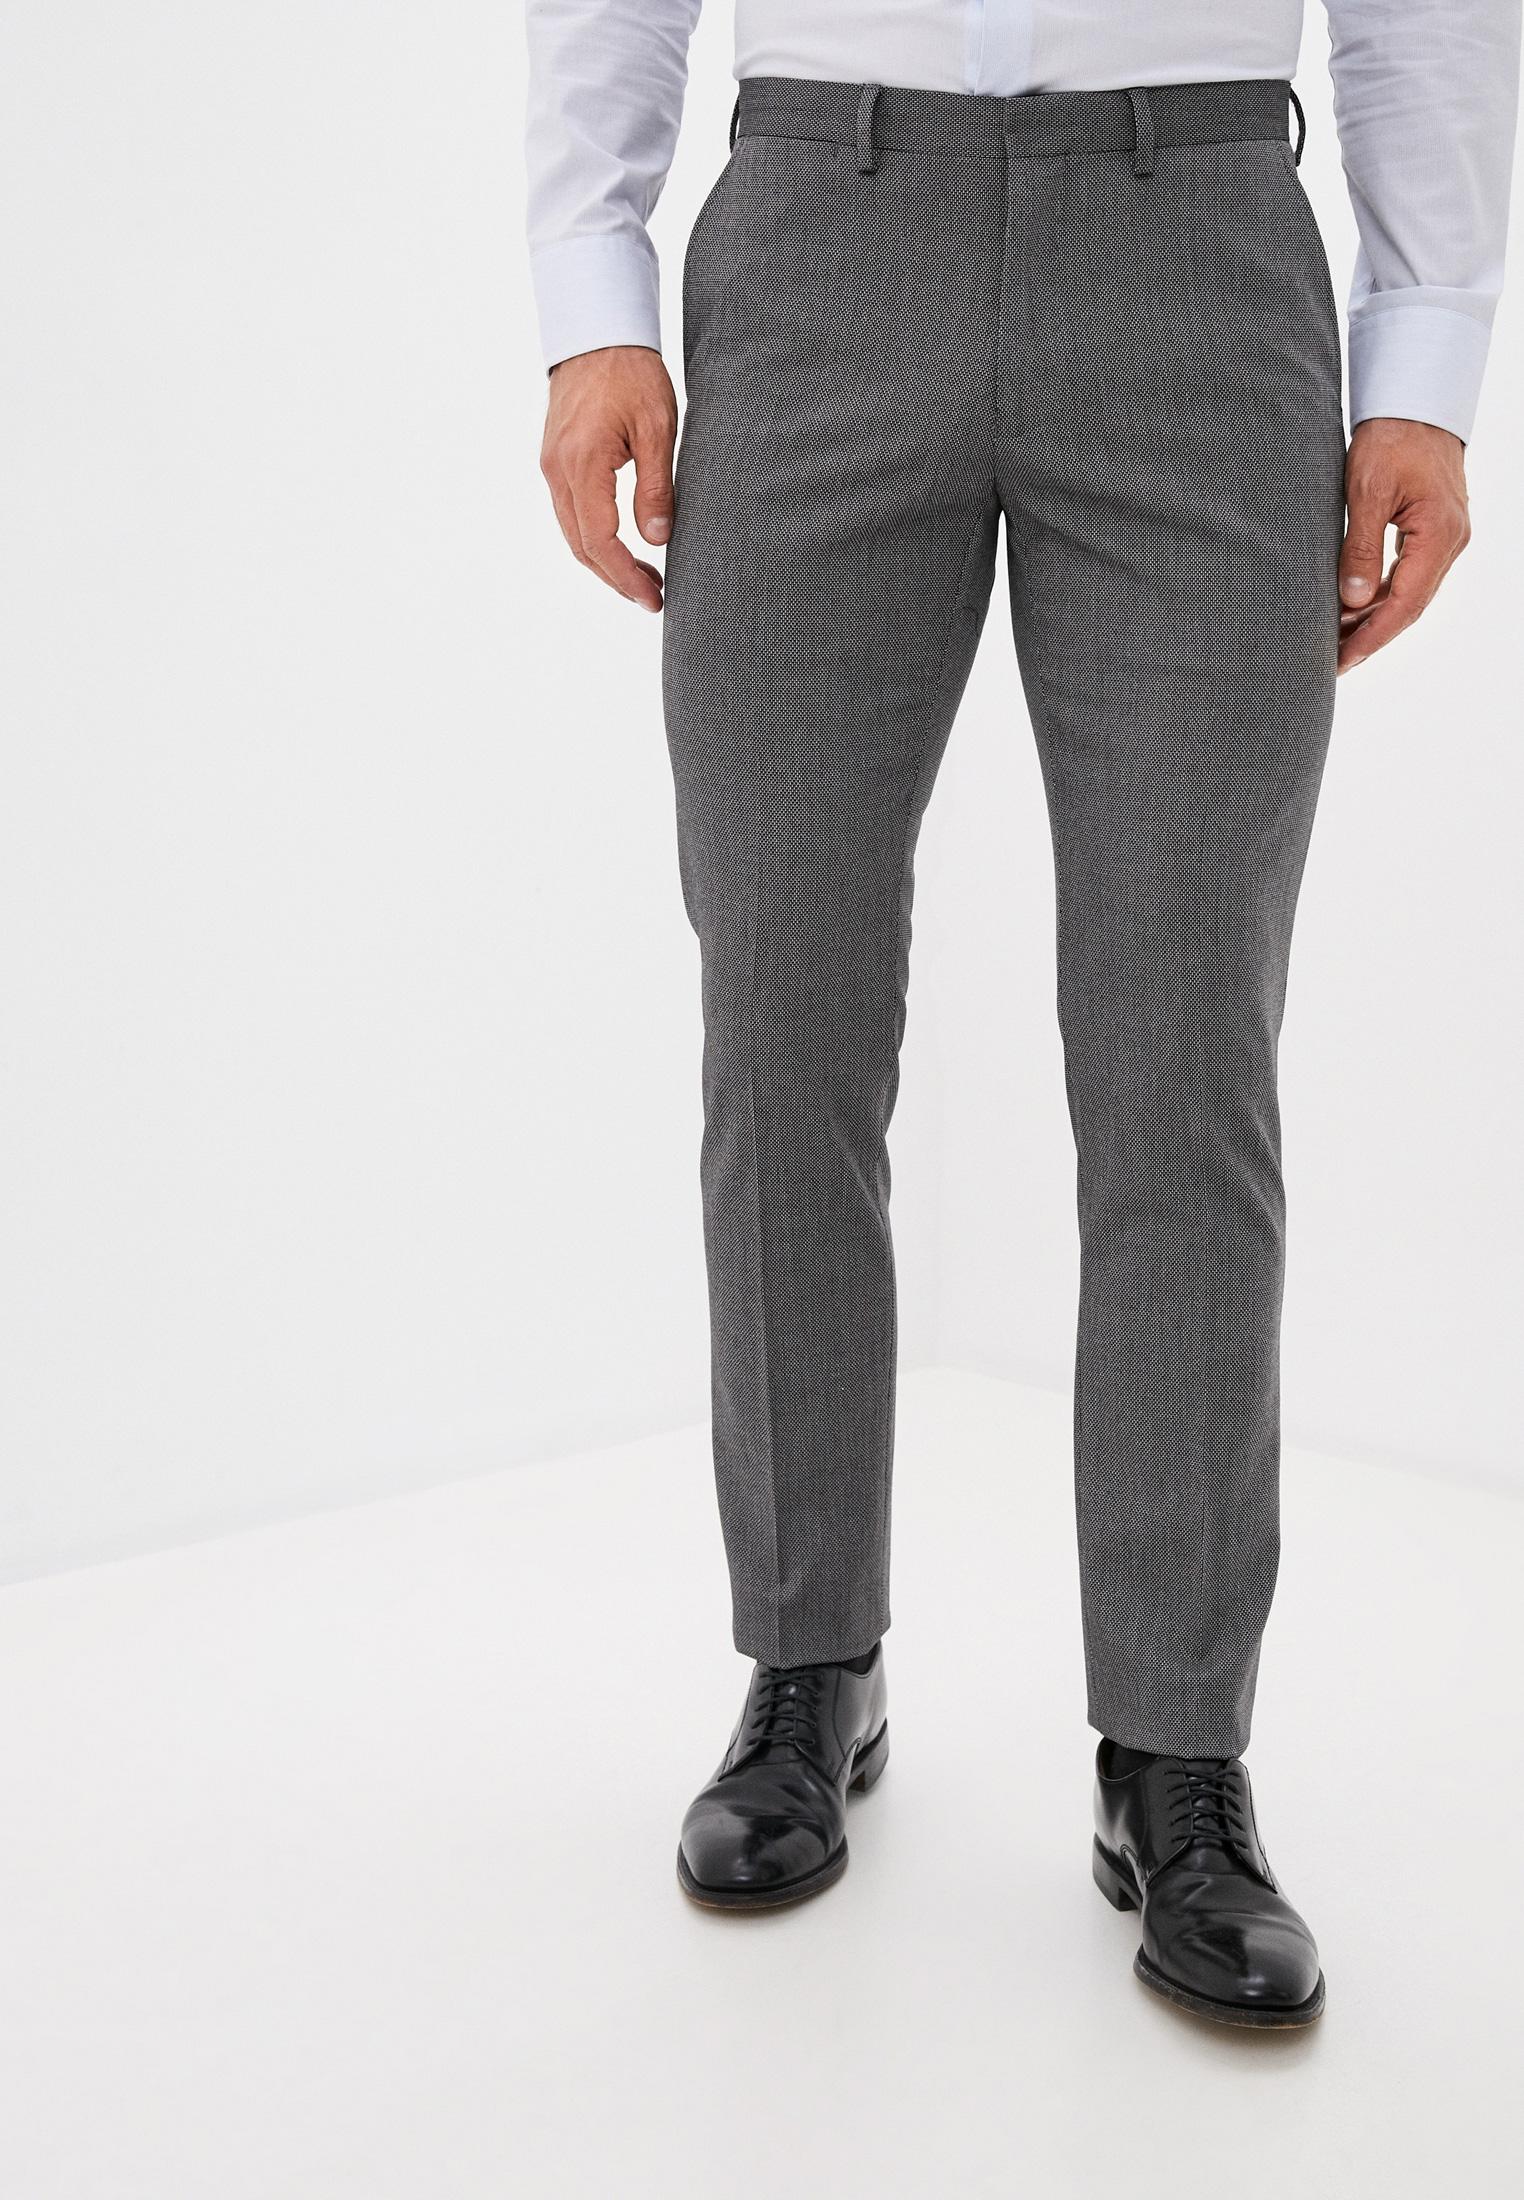 Мужские классические брюки Celio (Селио) Брюки Celio